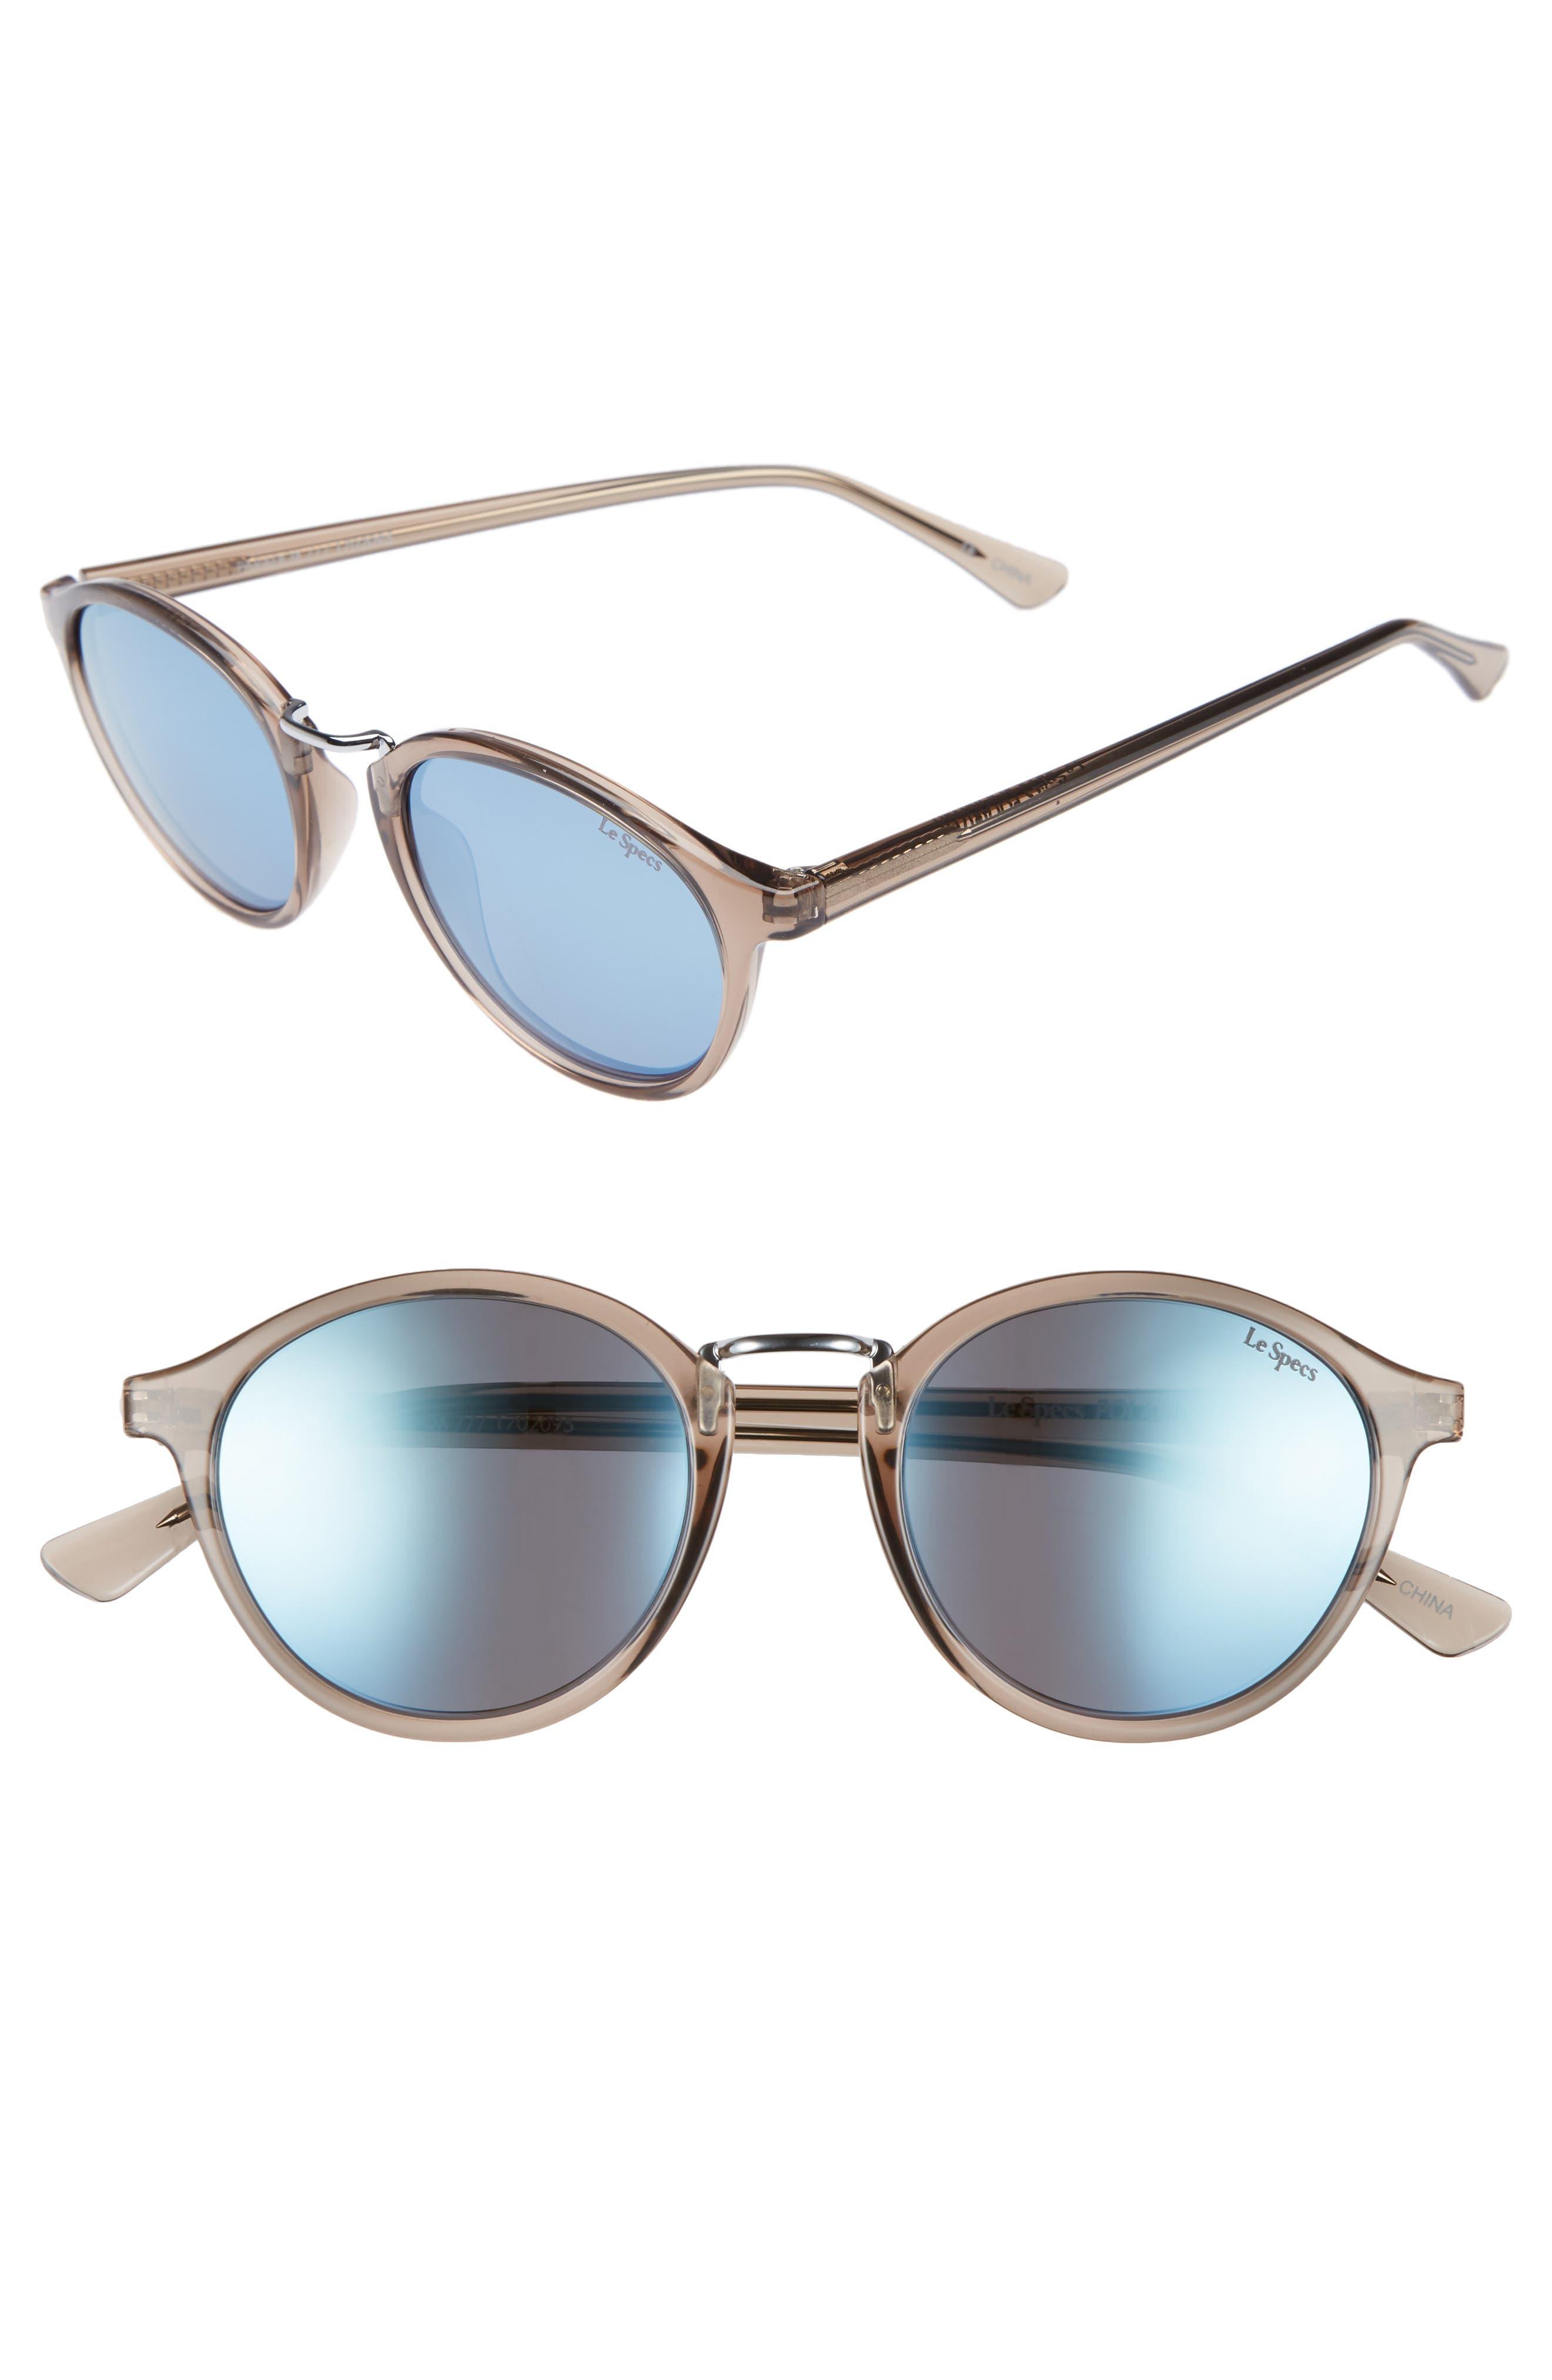 Paradox 49mm Oval Sunglasses,                             Main thumbnail 2, color,